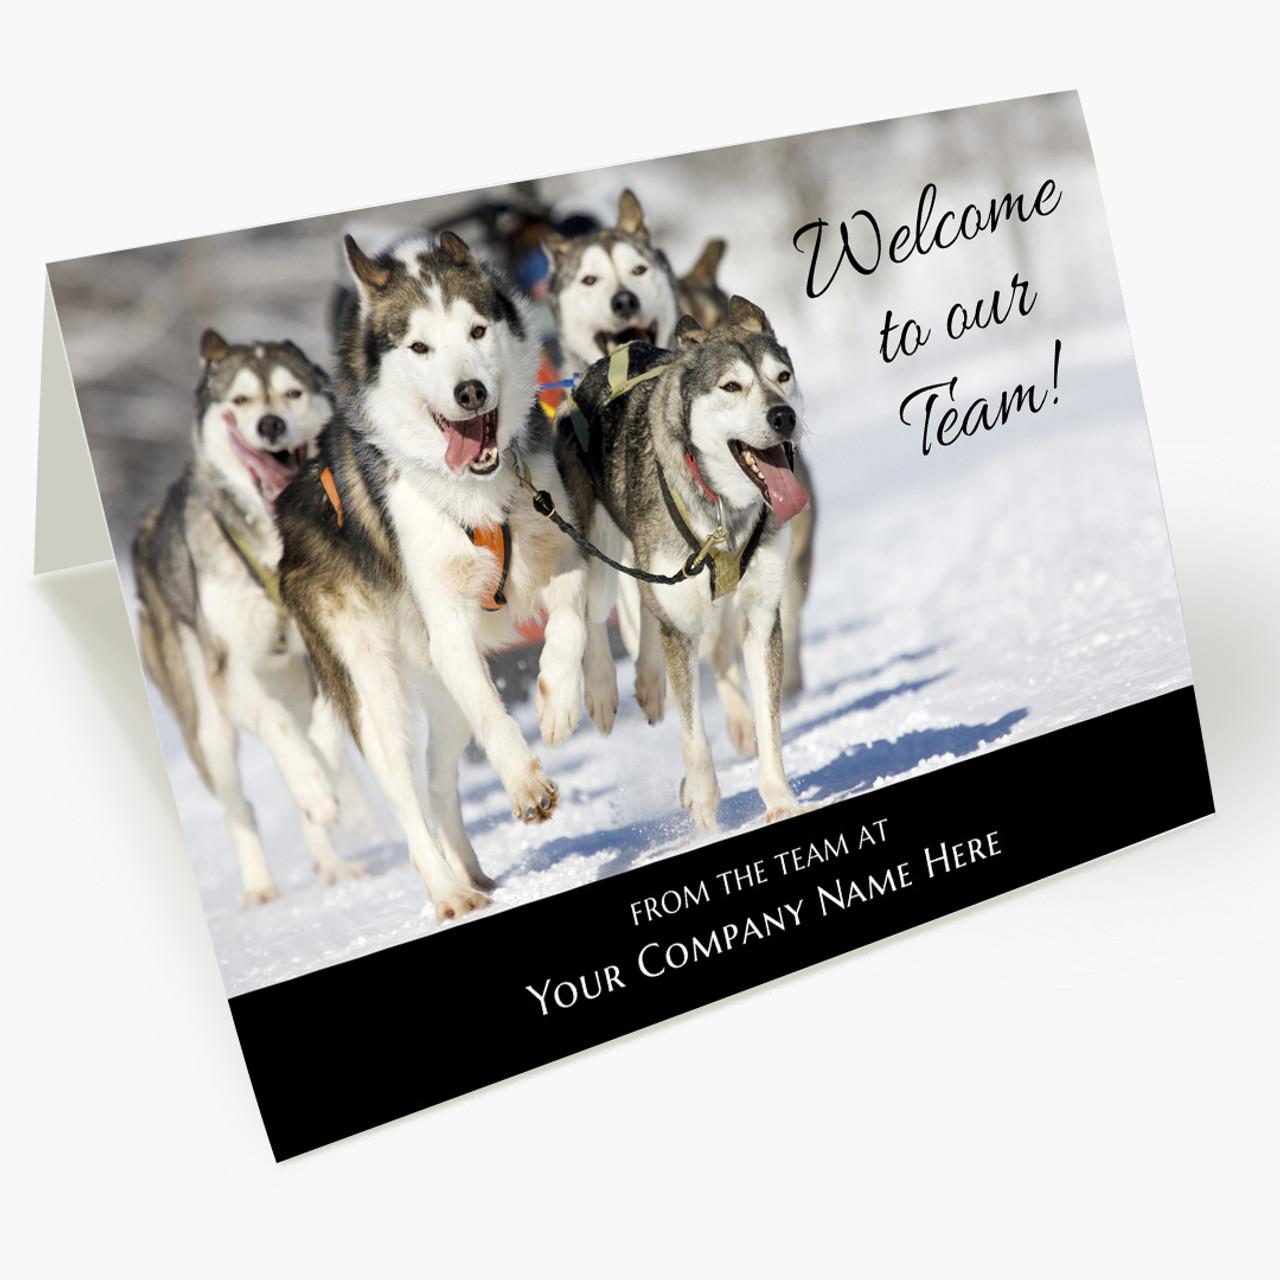 Welcome Team Card